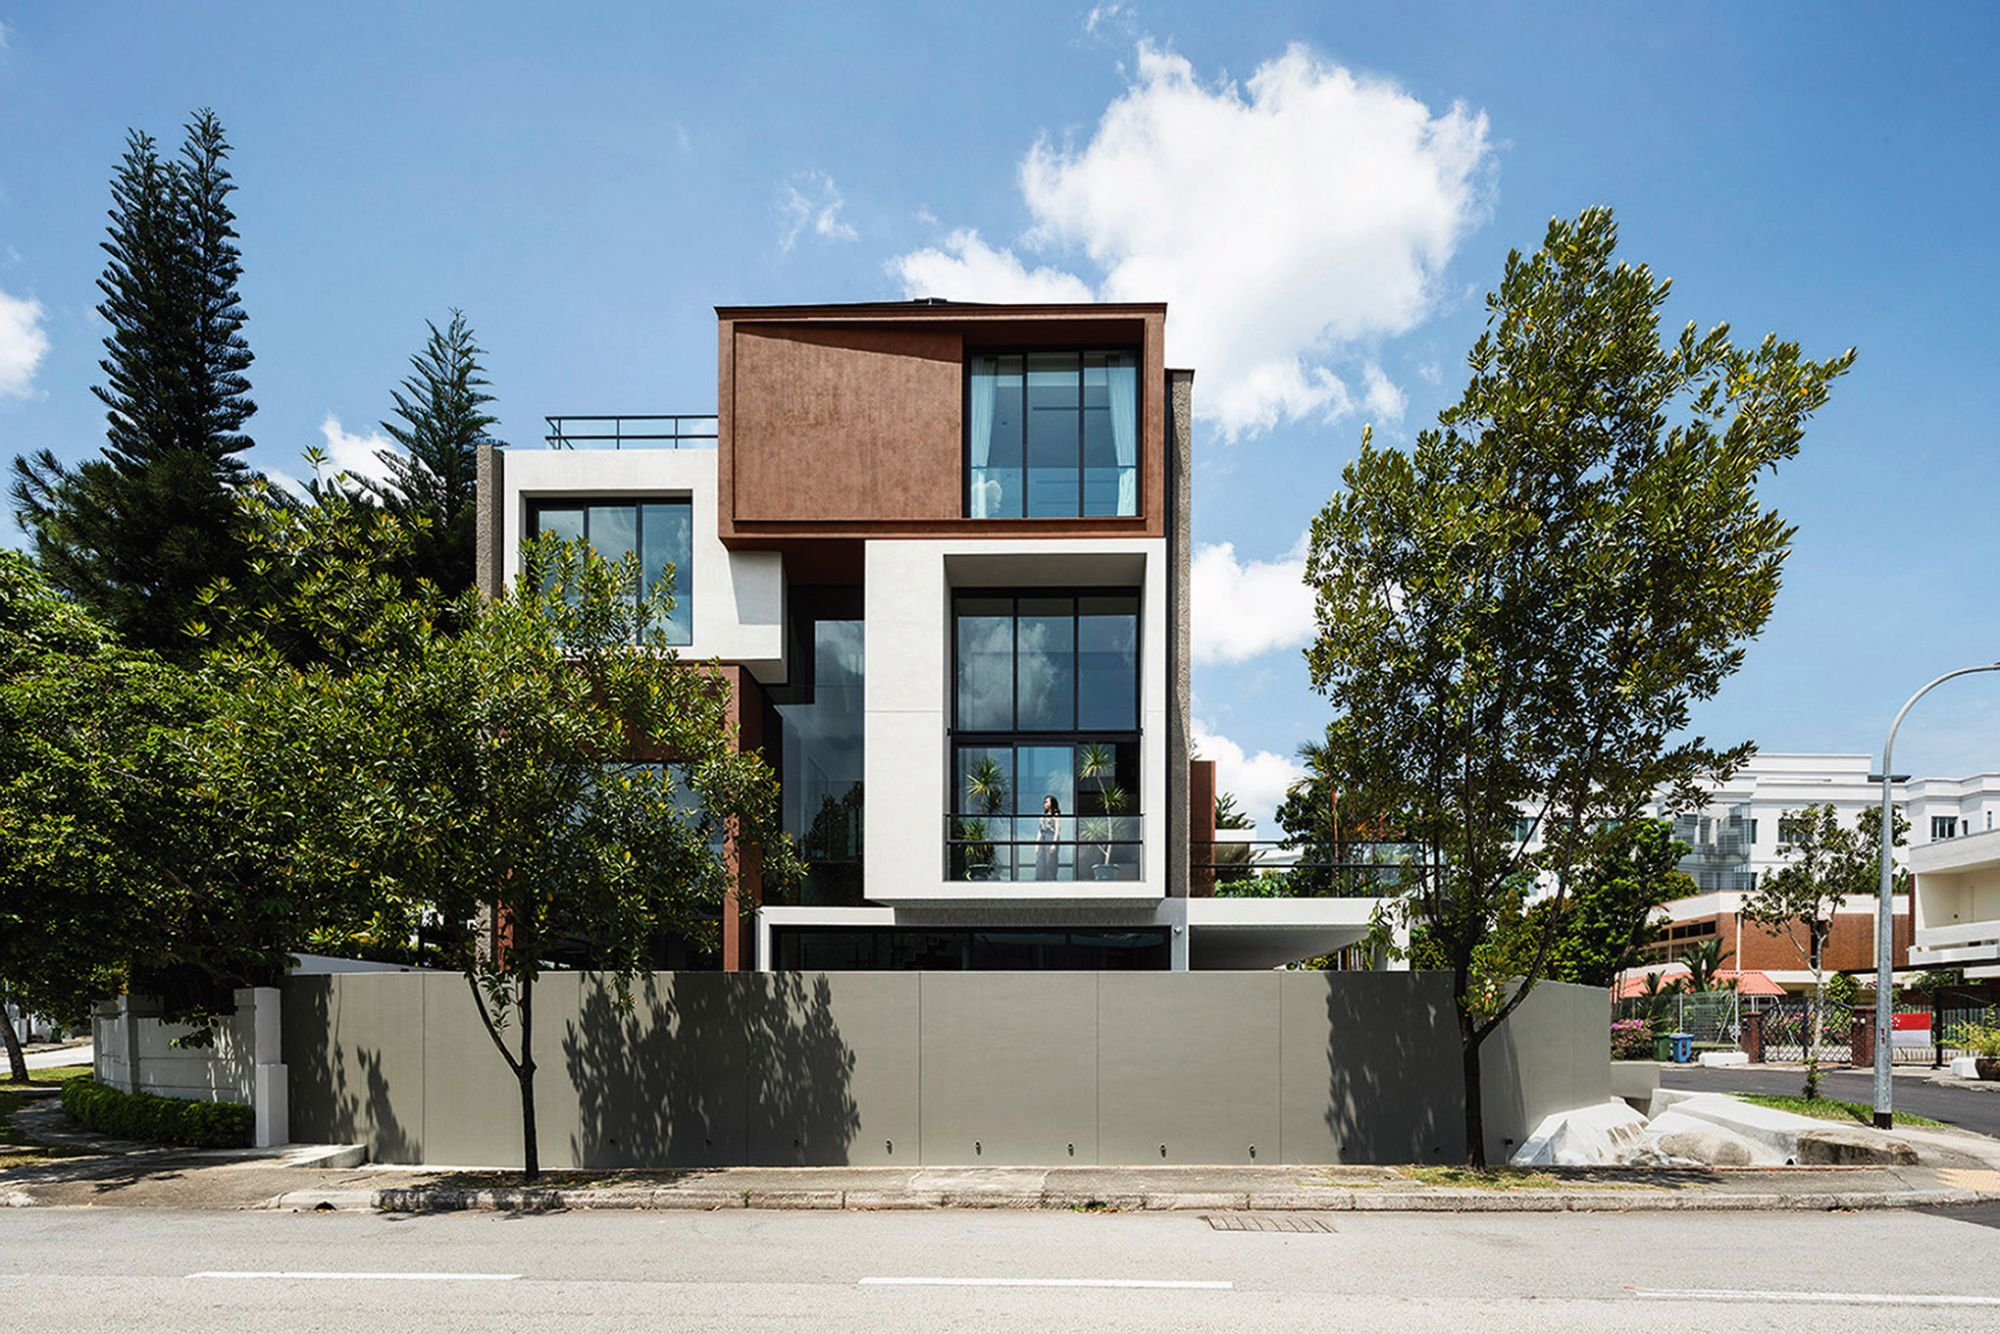 Home Tour: A Semi-Detached House By Park + Associates With Playful Split-Levels